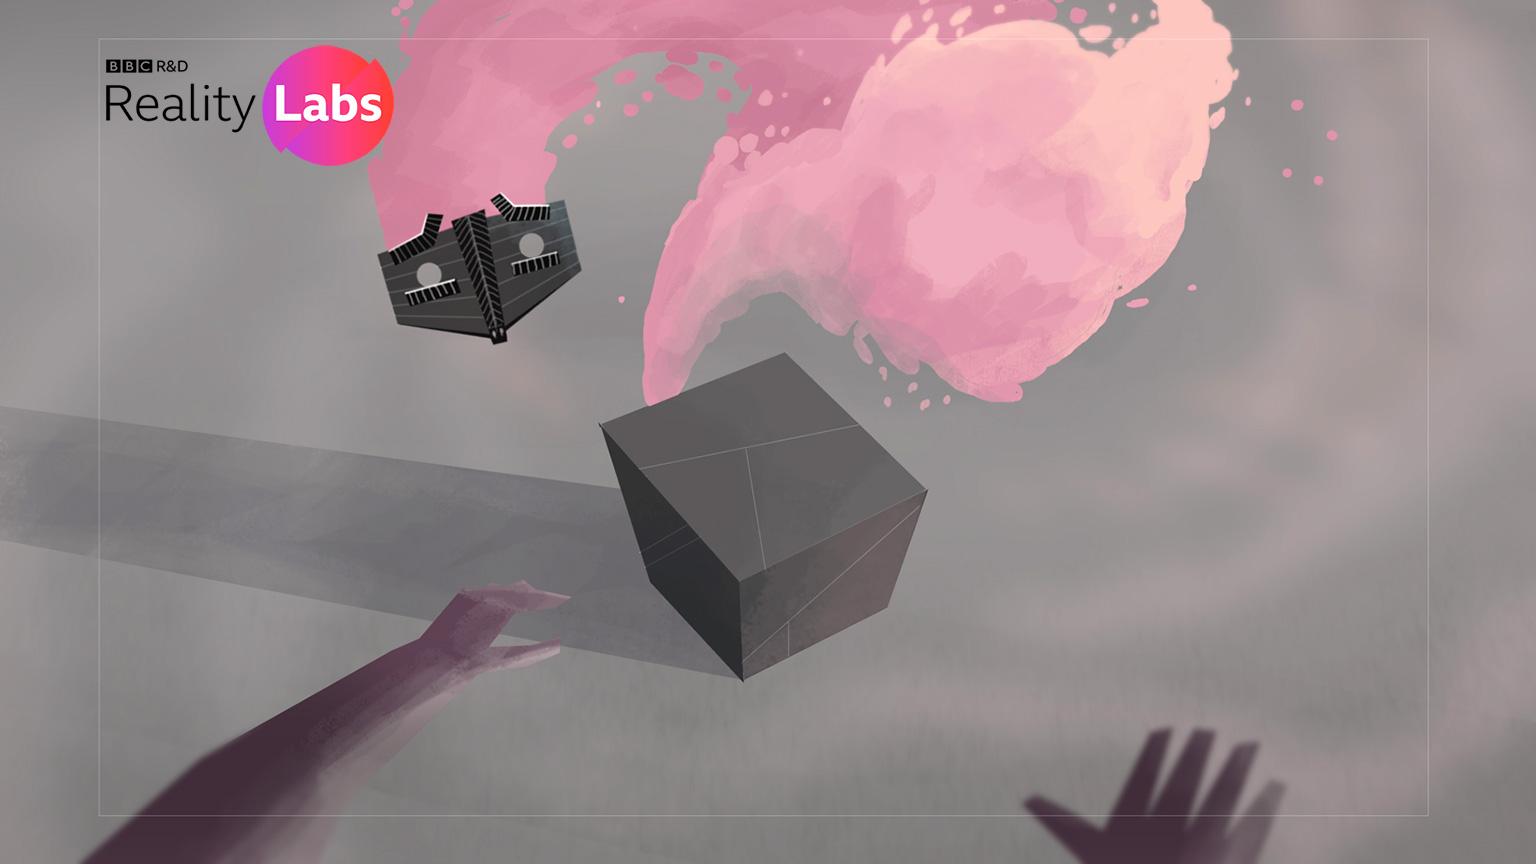 BBC成立BBC Reality Labs,负责VR-AR内容创作